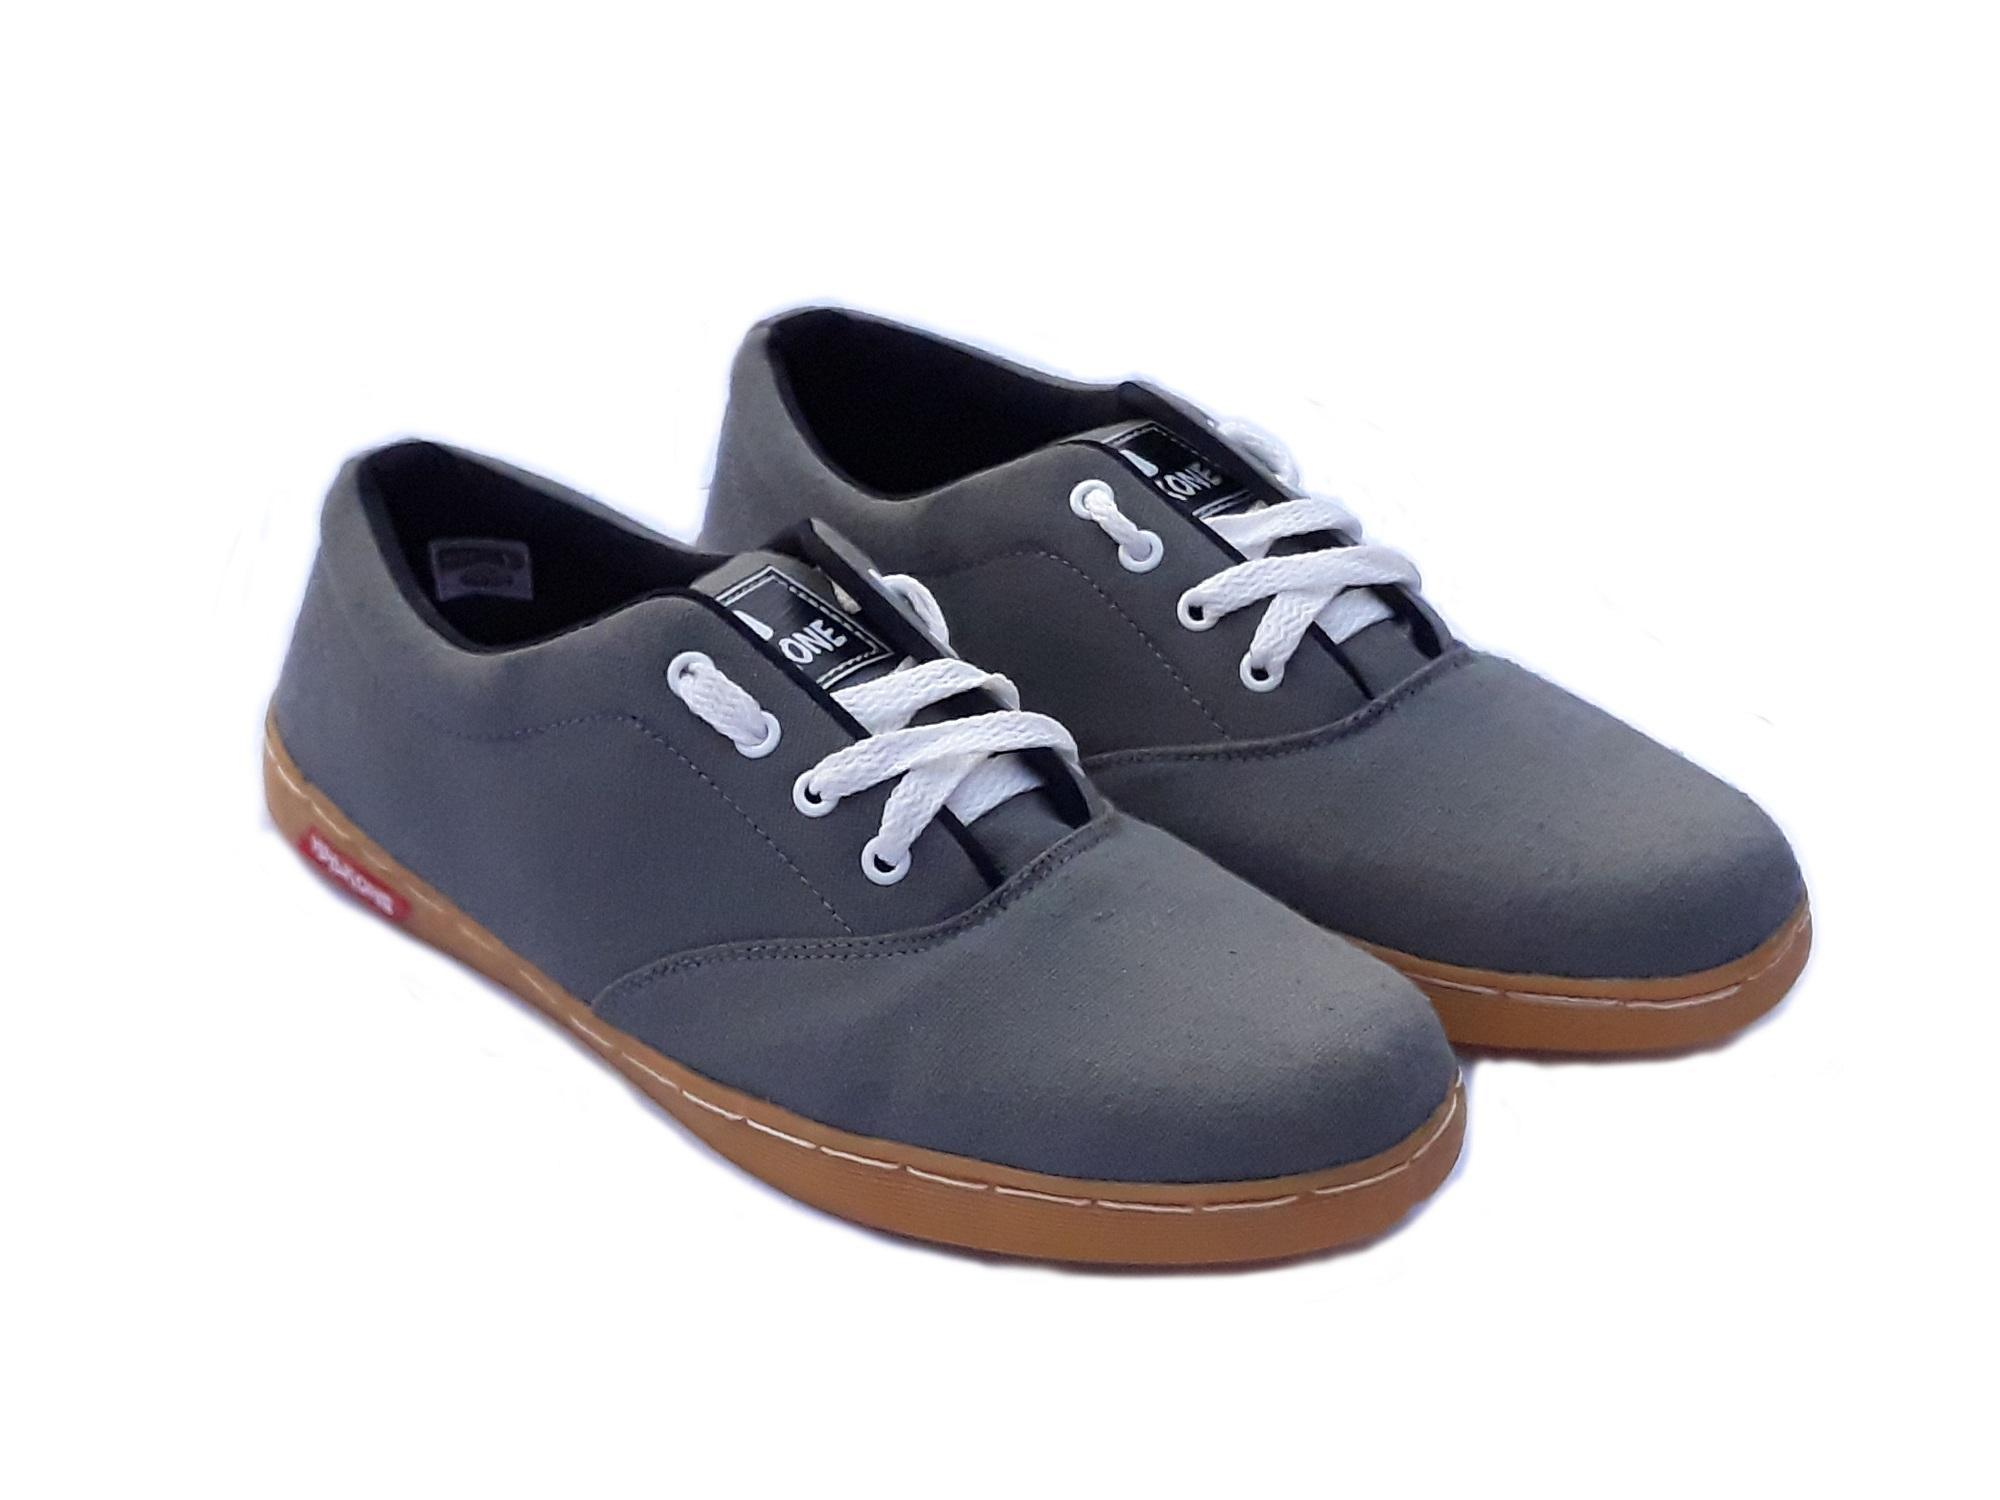 Sepatu Sneakers / Kets / Slip On / Sport Wanita Masa Kini Model Terbaru YS. IDR 58,000 IDR58000. View Detail. Halkoneku Halkone YS Sneaker Pria